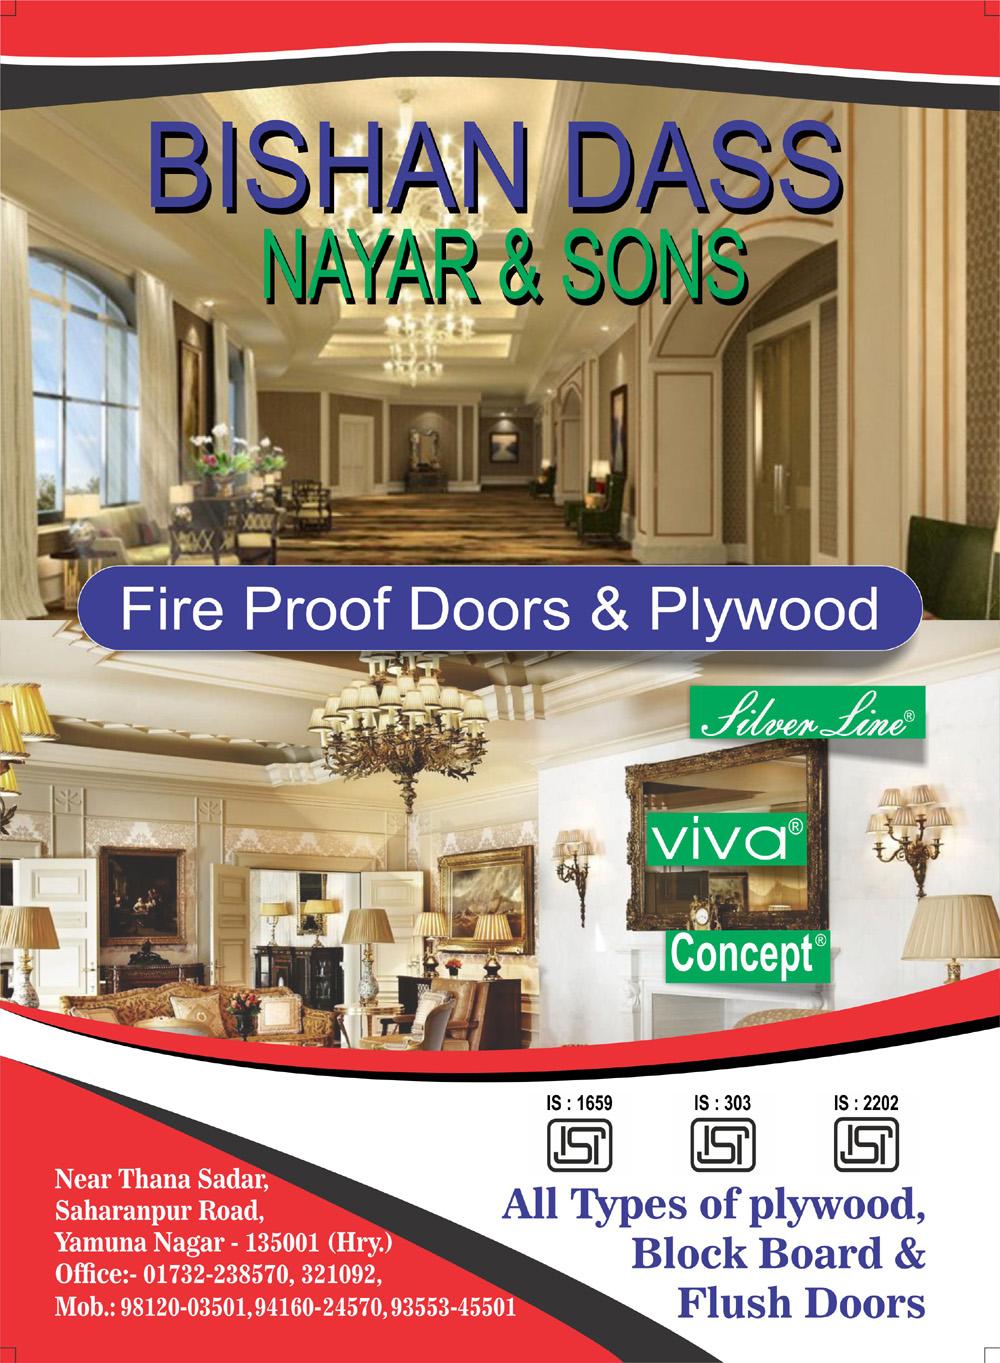 Bishan Dass Nayar & Sons